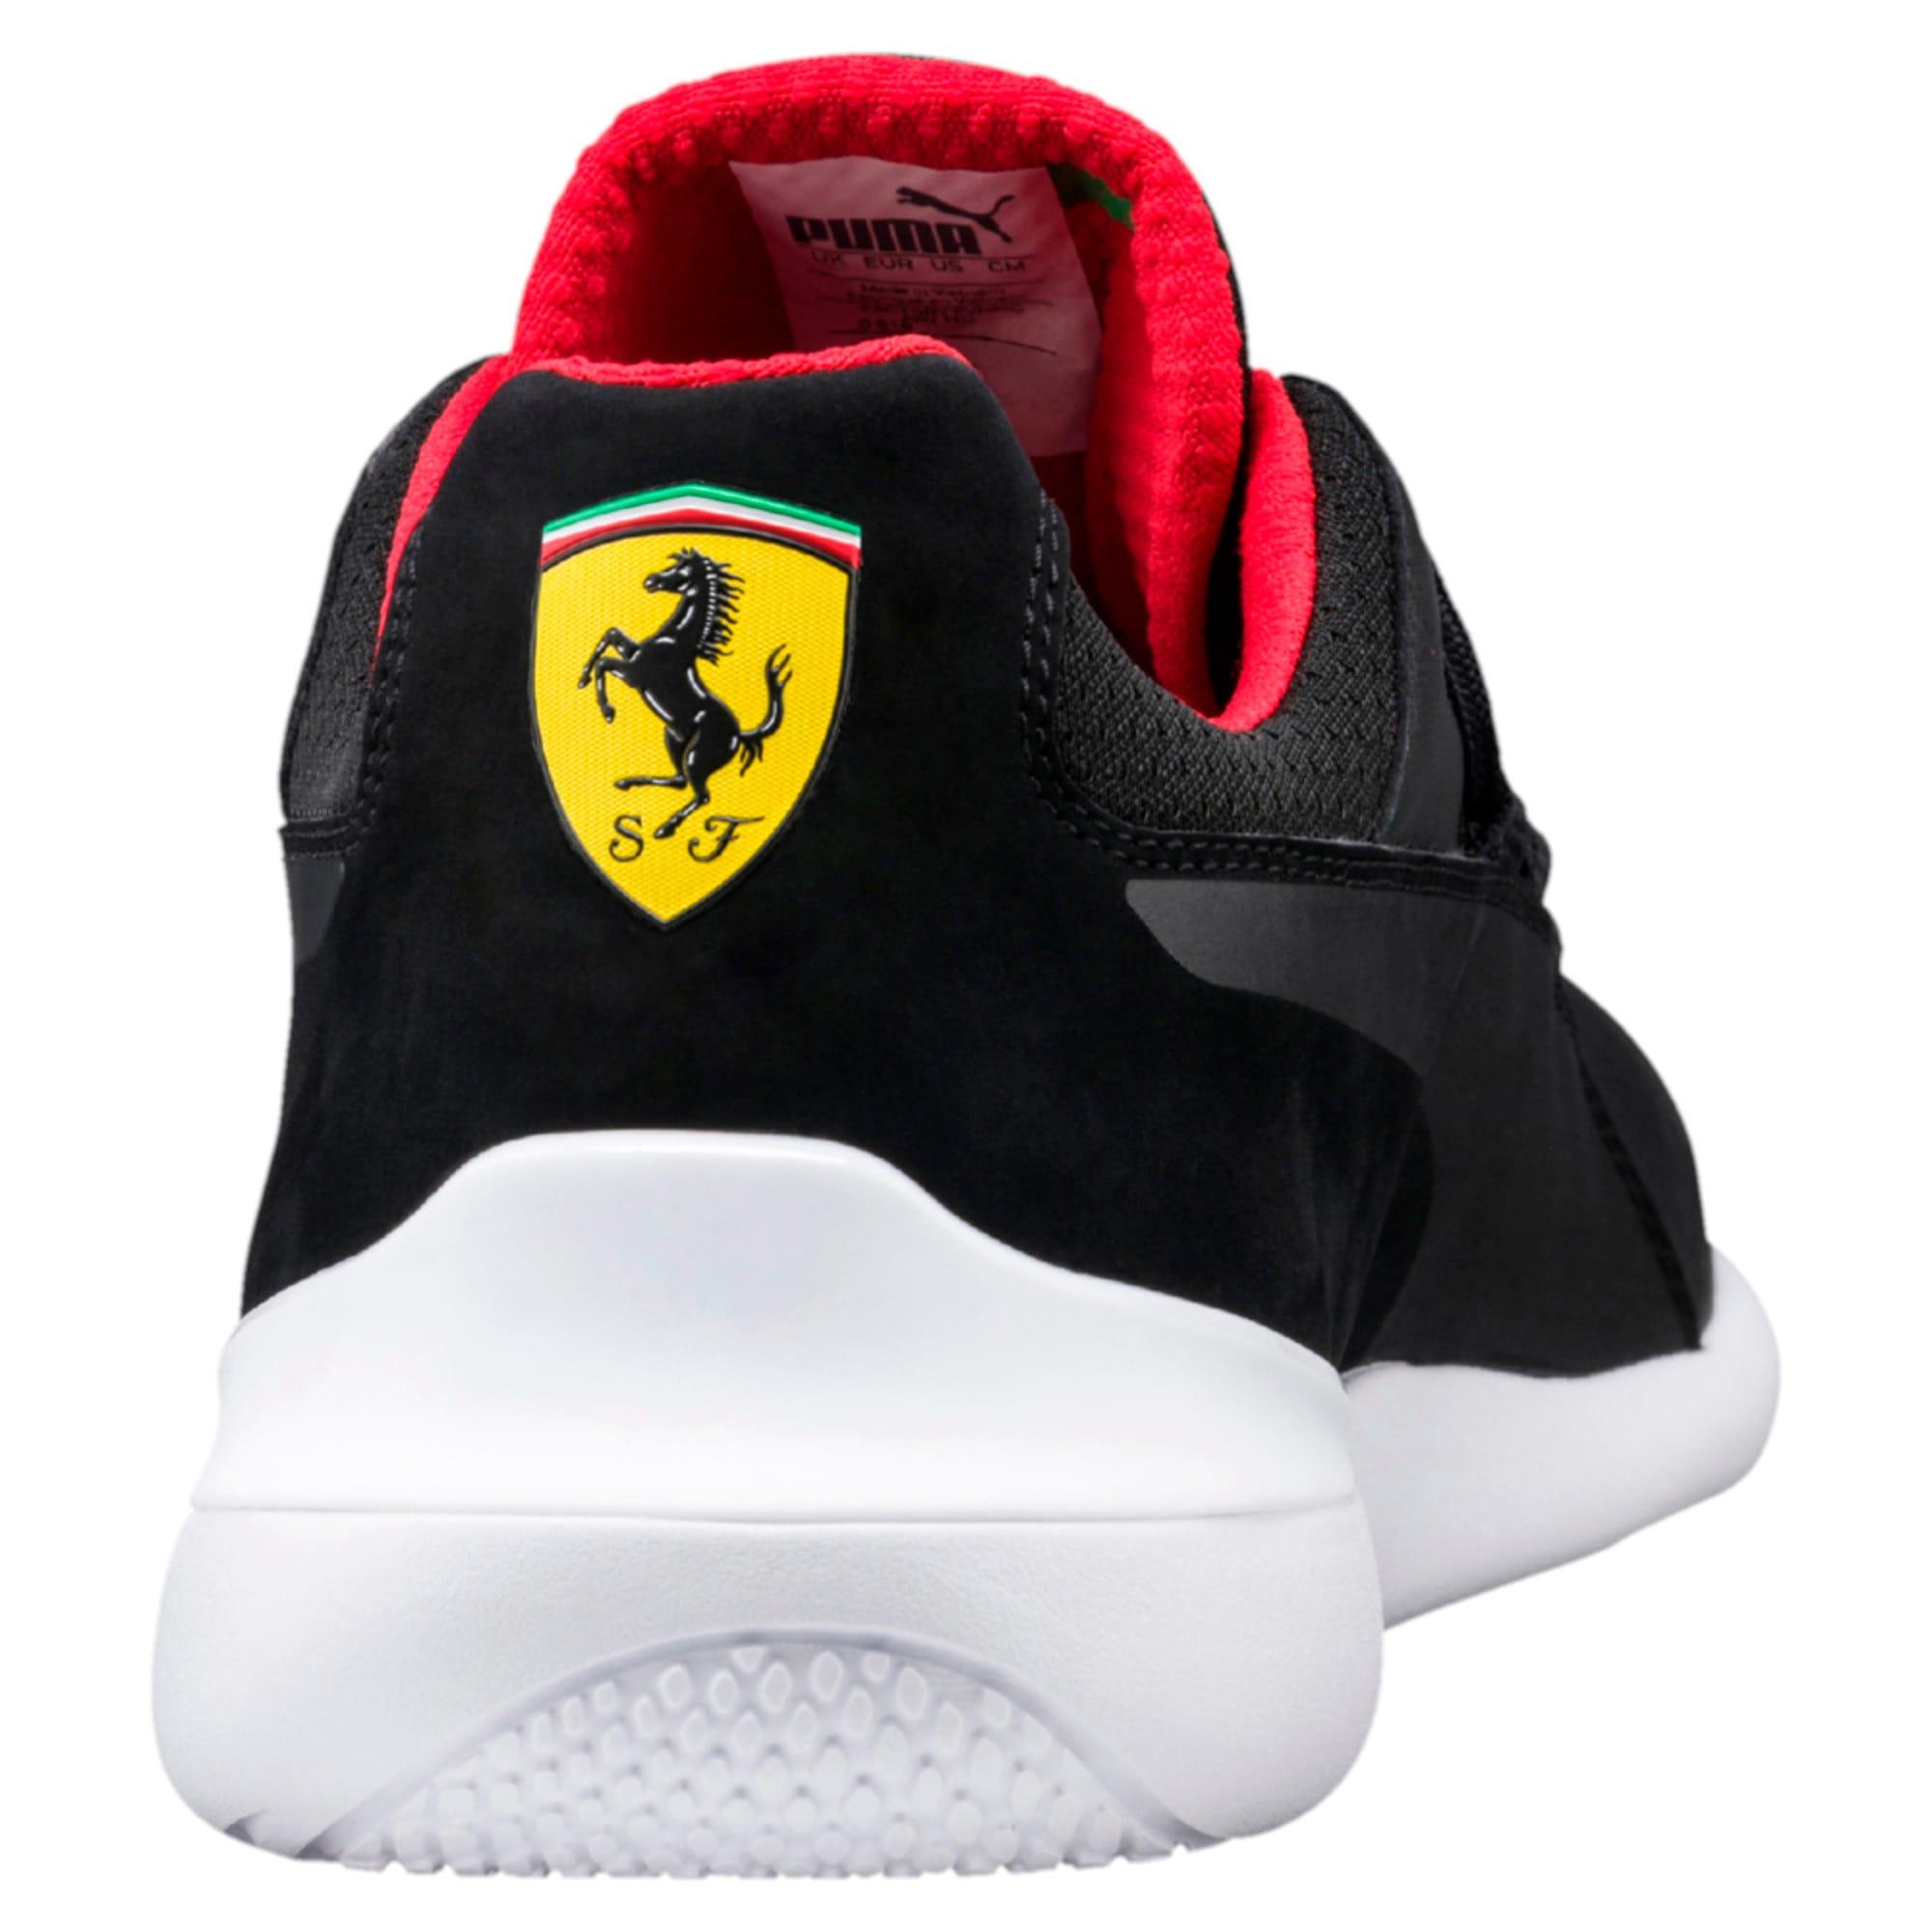 Thumbnail 4 of Ferrari Evo Cat Men's Trainers, Puma Black-Puma Black-White, medium-IND